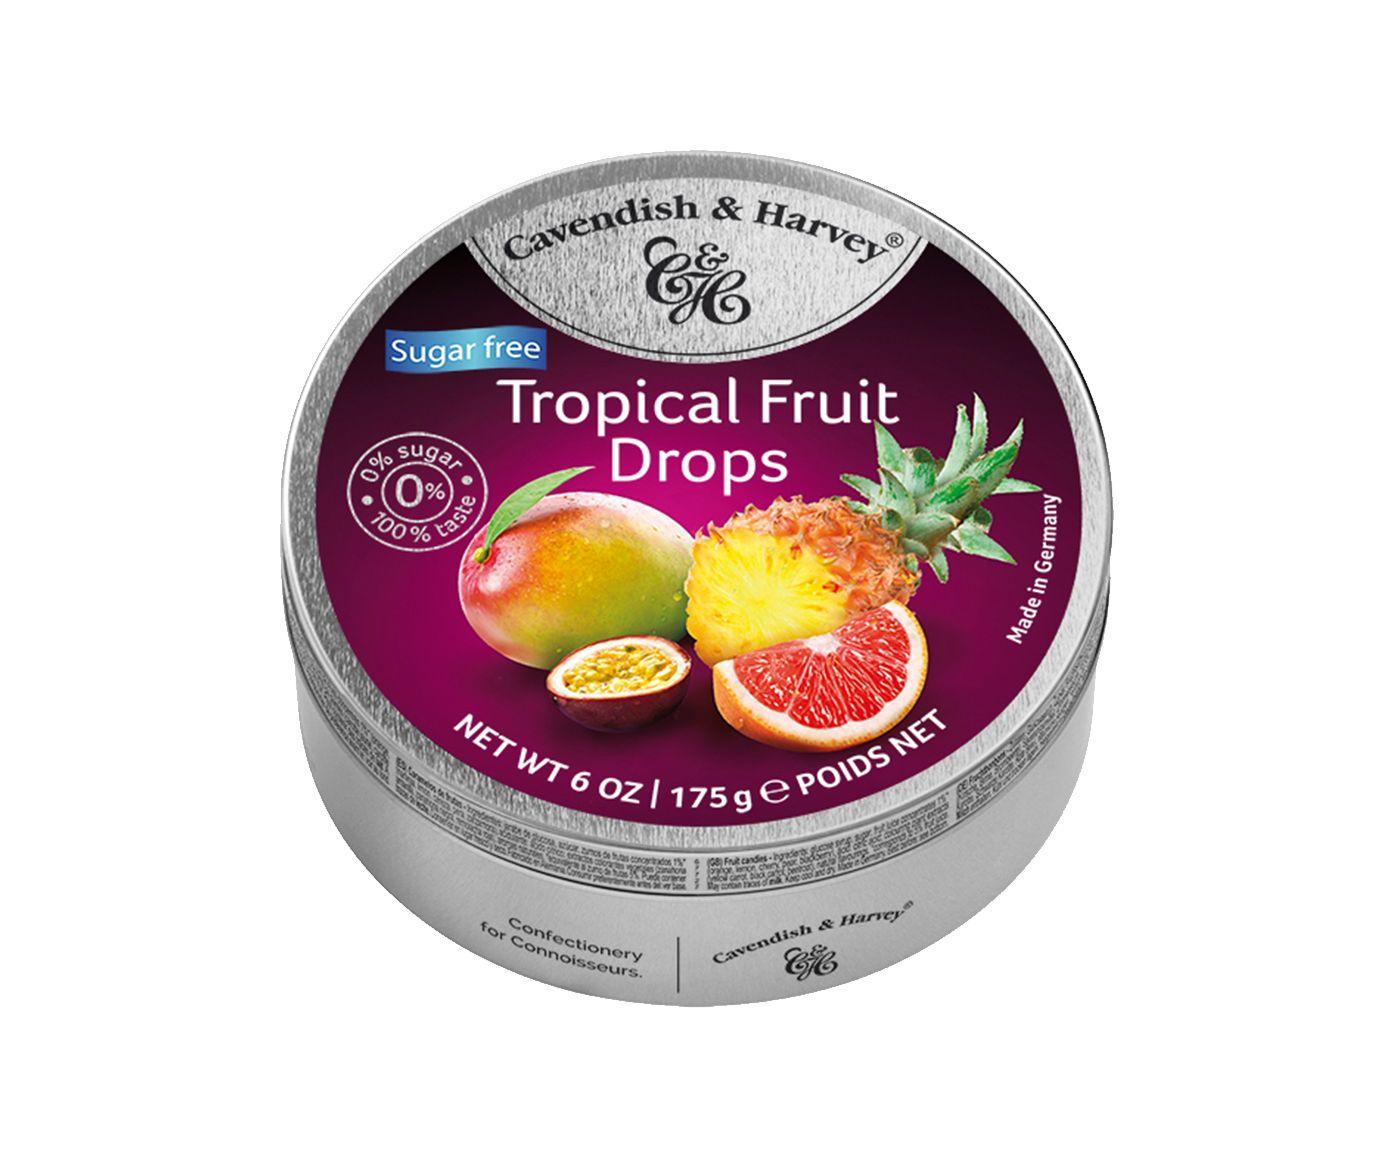 Bala Alemã Cavendish & Harvey Sugar Free Tropical Fruit Drops - 175G | Westwing.com.br